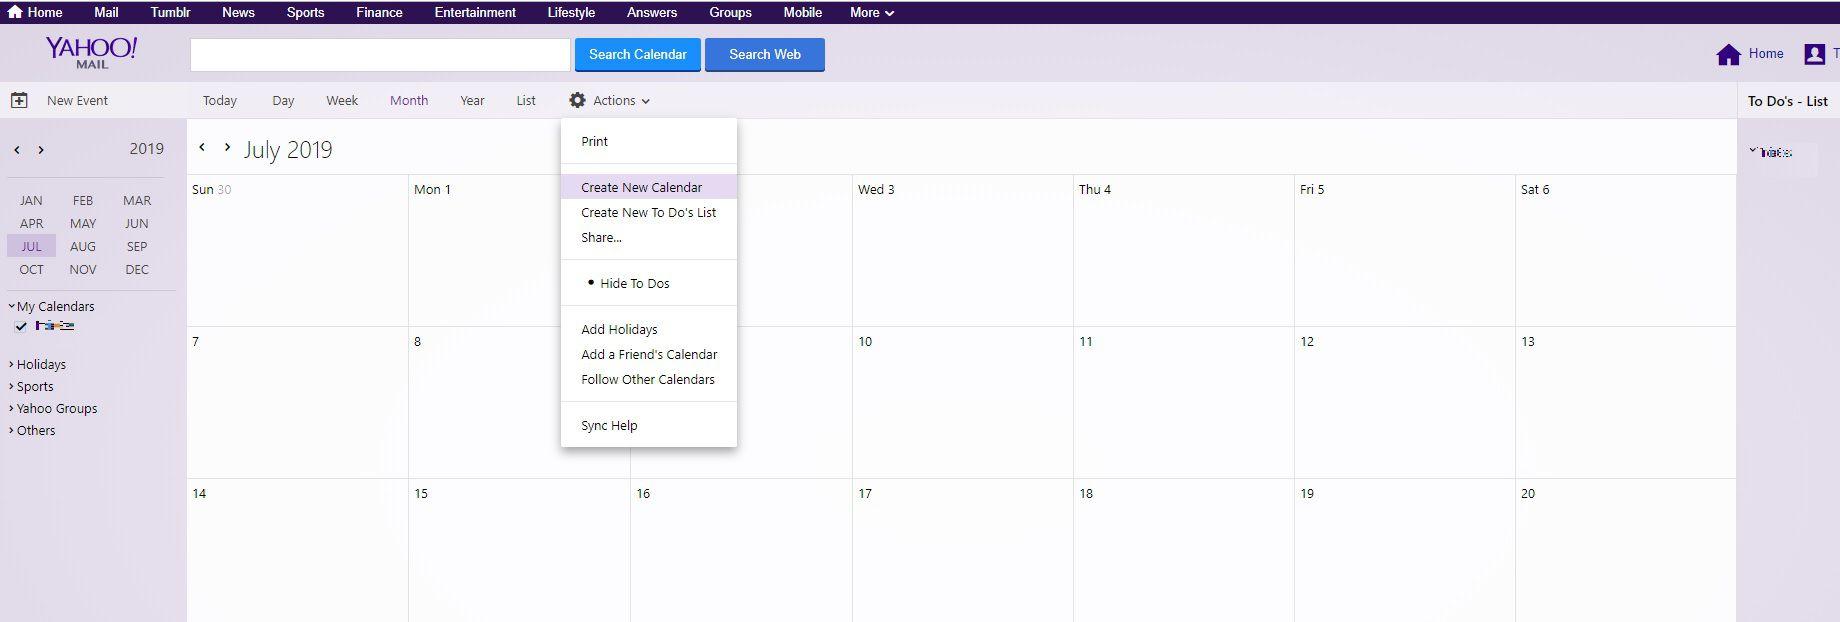 How to Set up Yahoo! Calendar iCal Sync